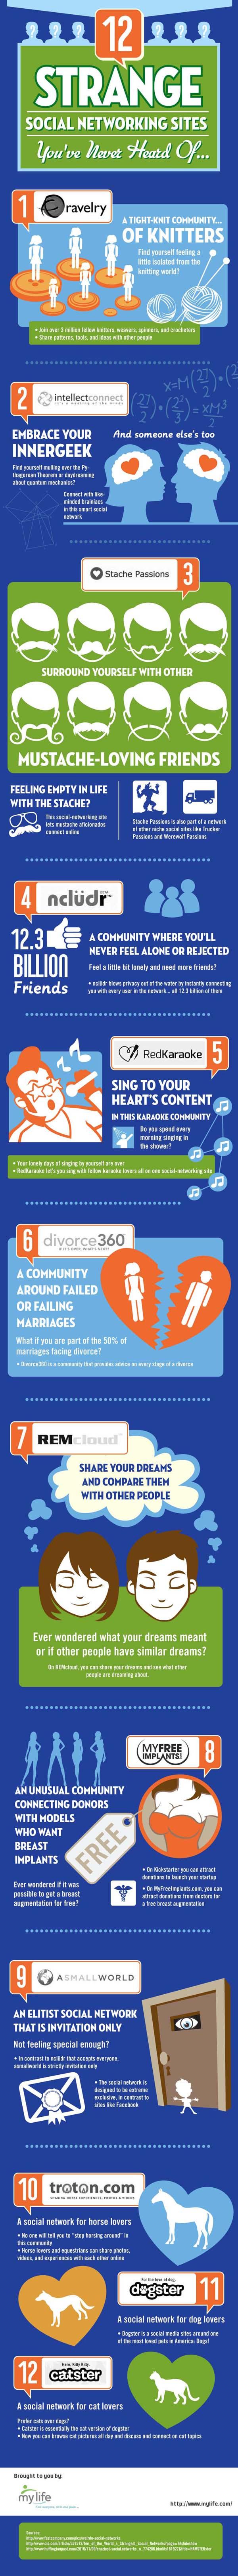 инфографика на 12 сайта от Mylife.com